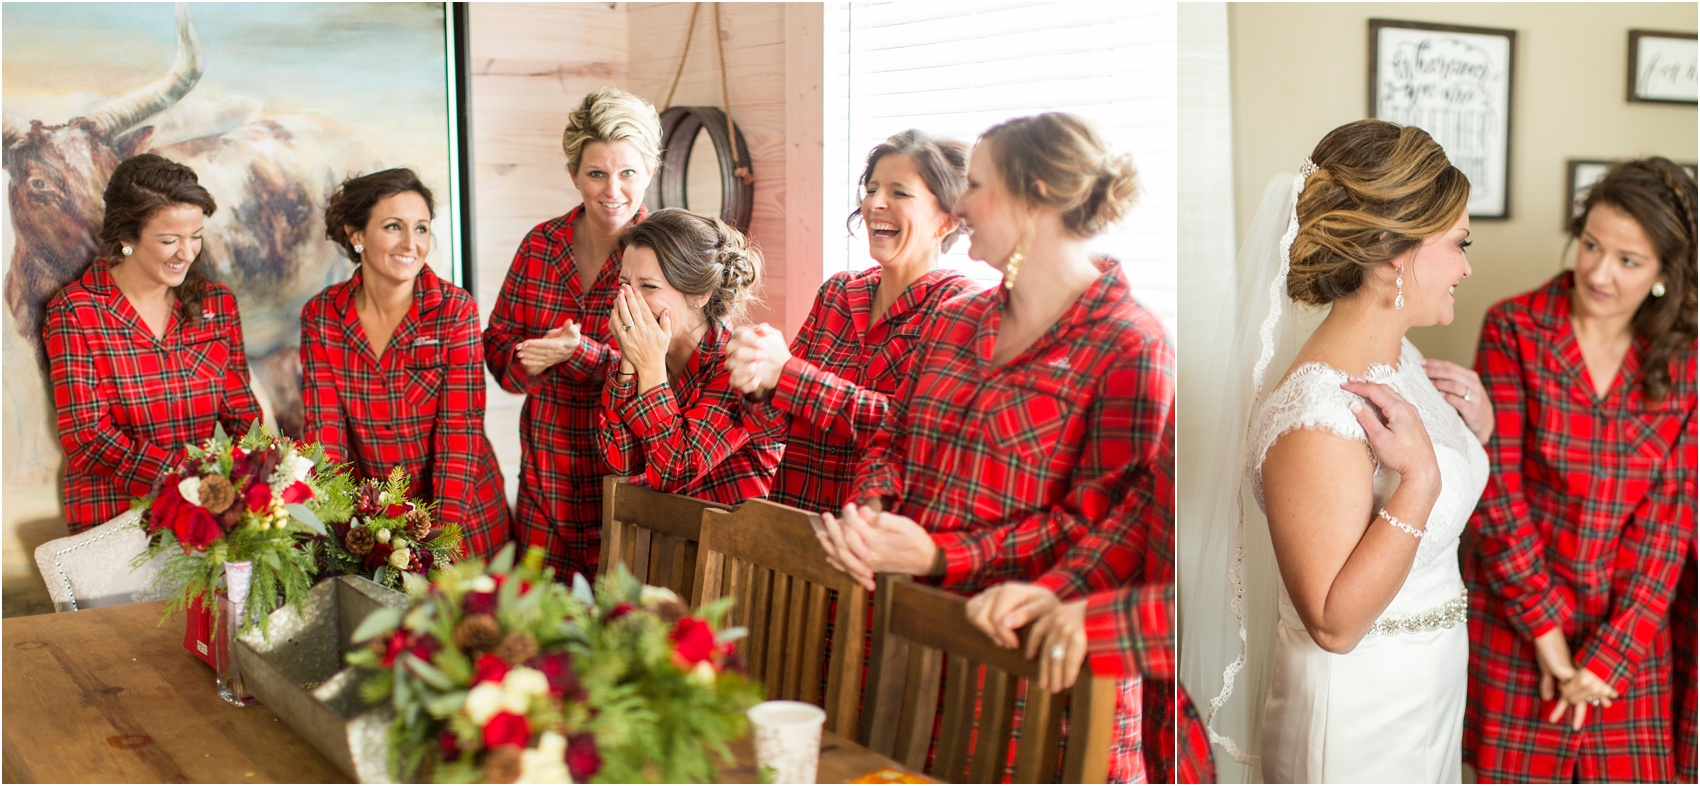 Savannah Eve Photography- Page Wedding Blog-18.jpg